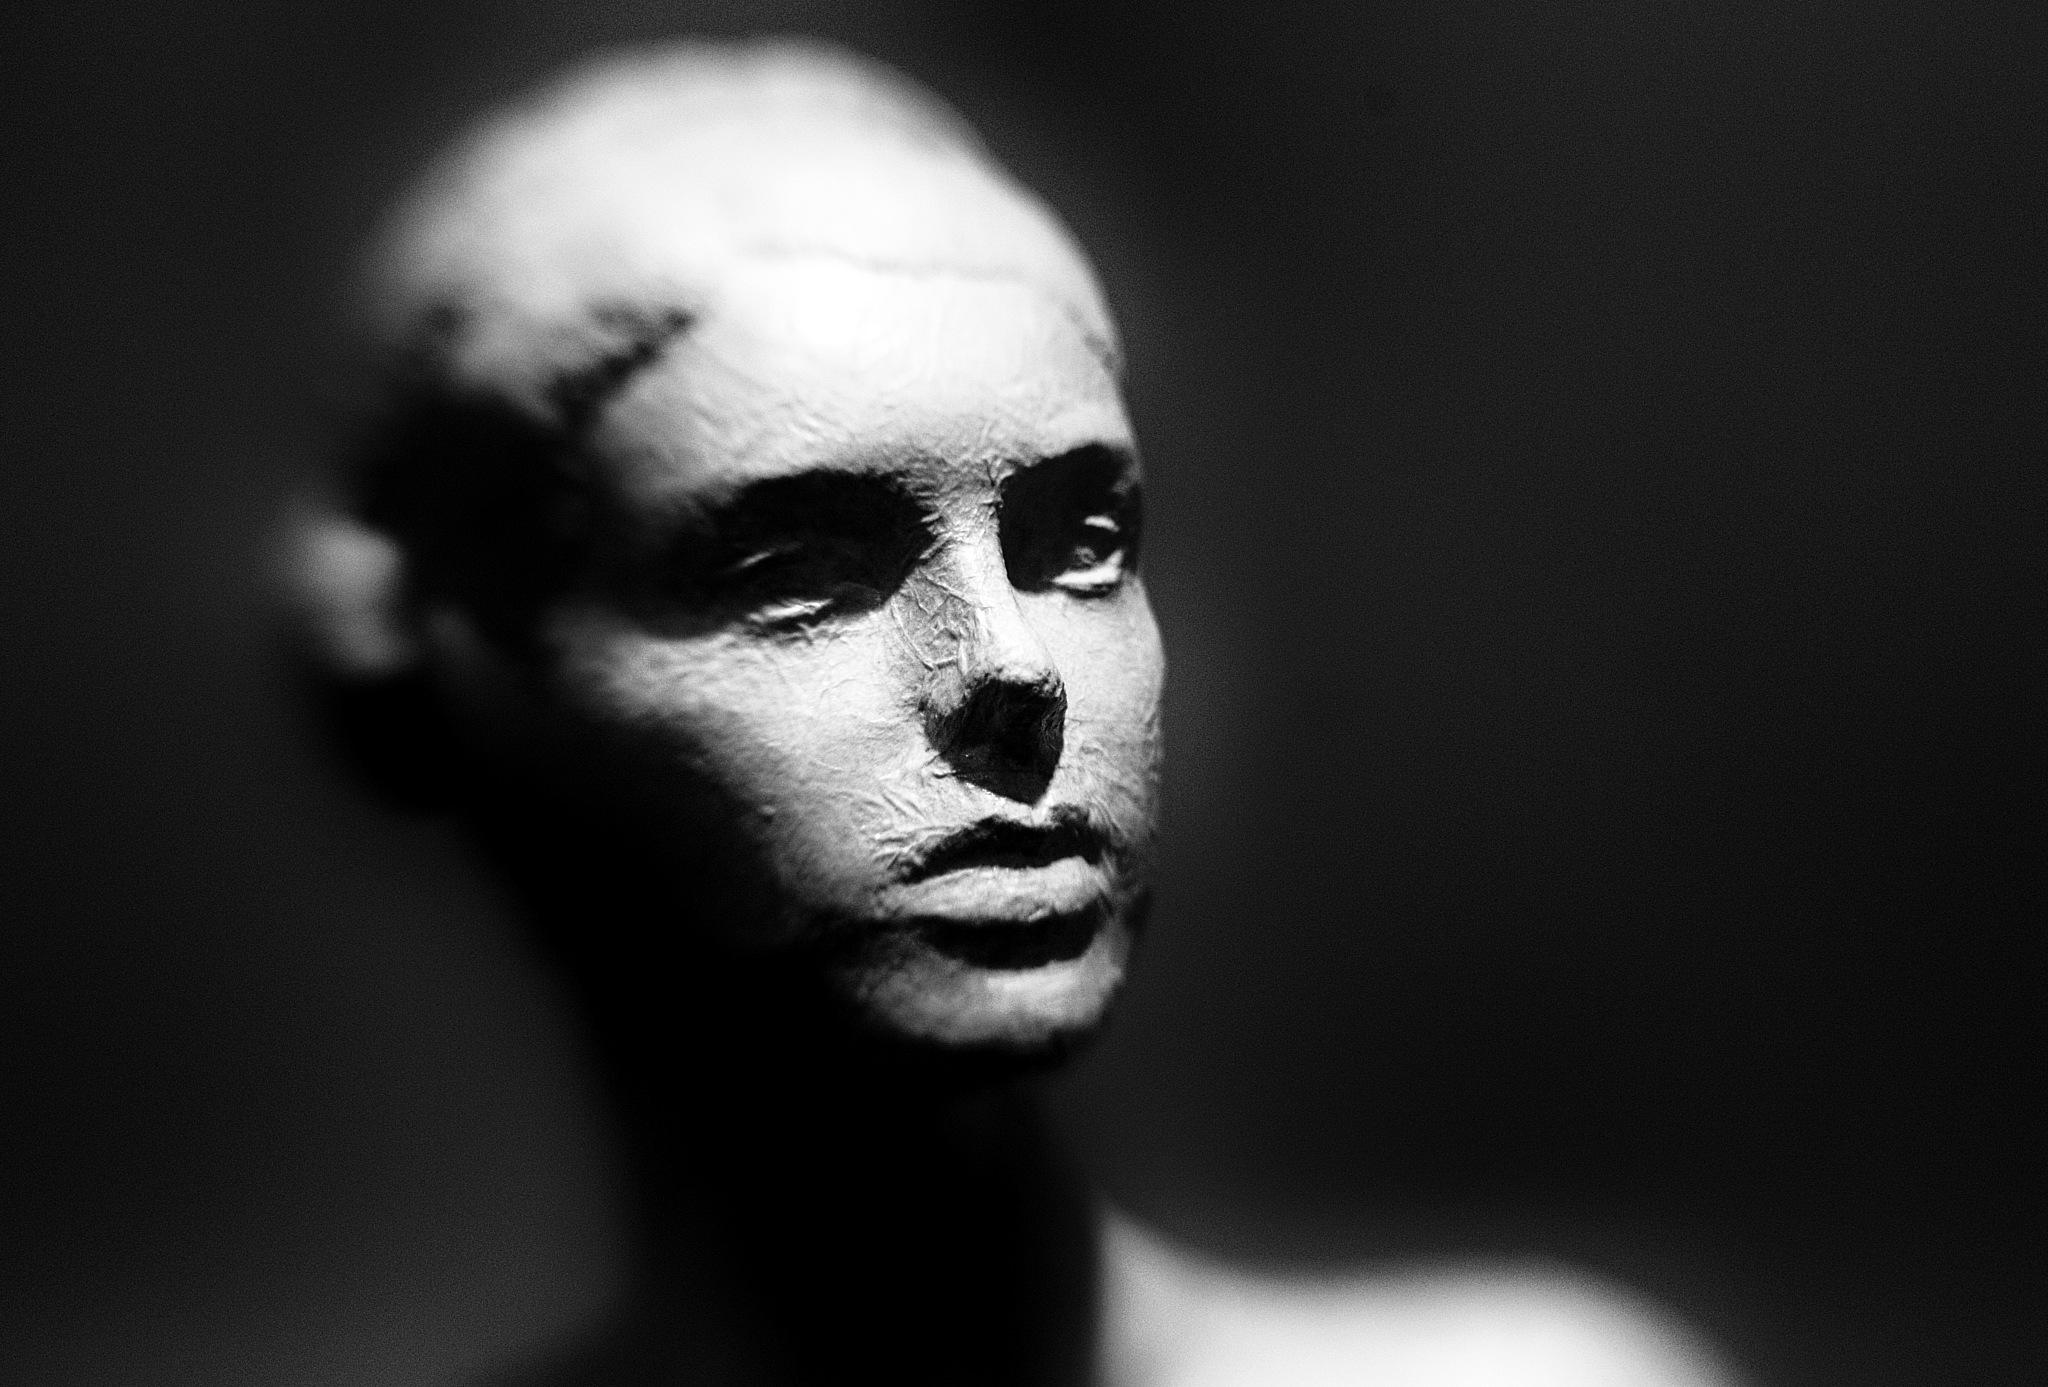 the unknown by Sasho Alushevski